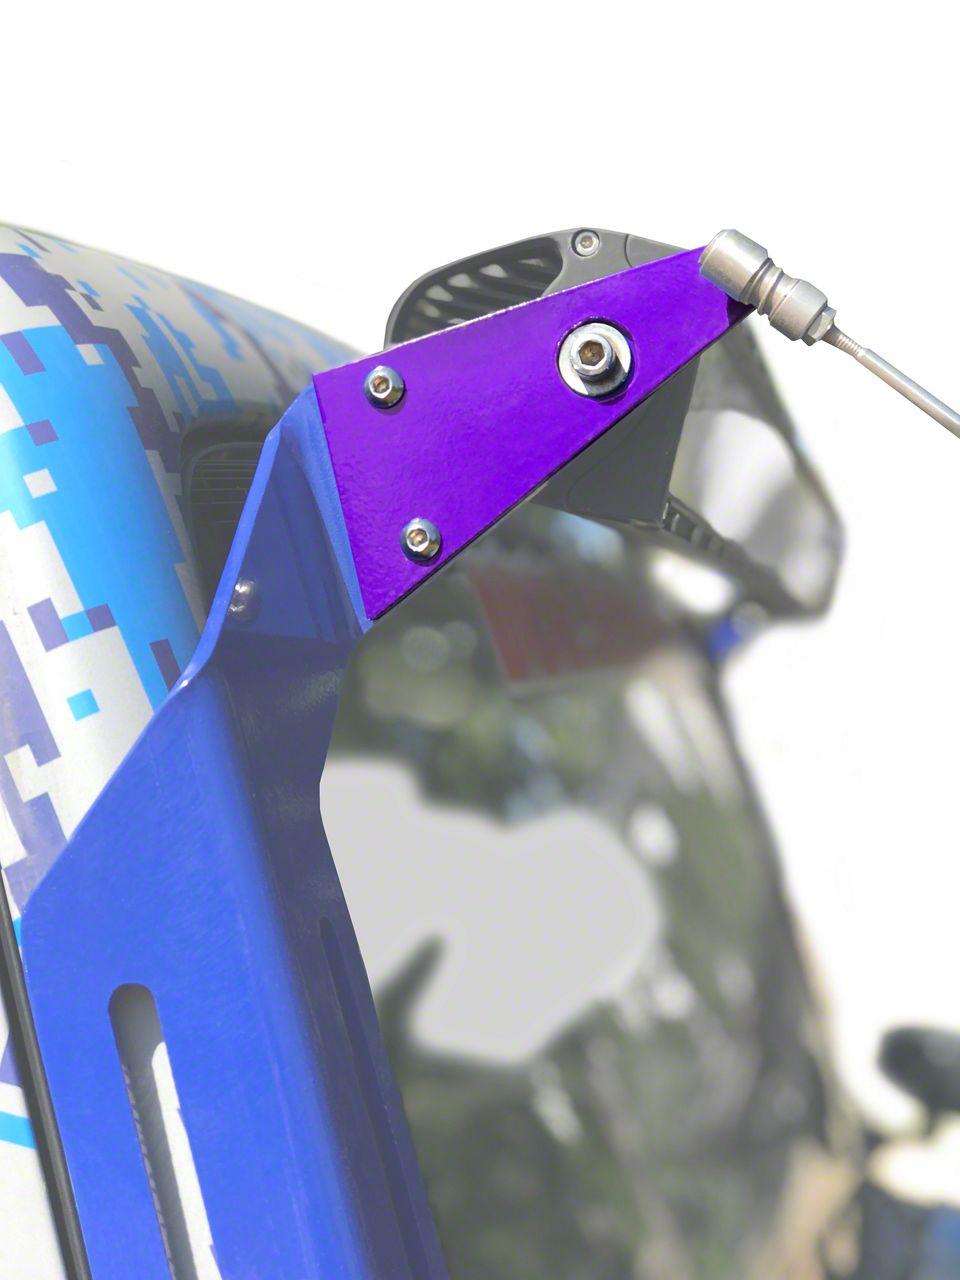 Steinjager A-Pillar Limb Riser Adaptor Brackets - Sinbad Purple (07-18 Jeep Wrangler JK)